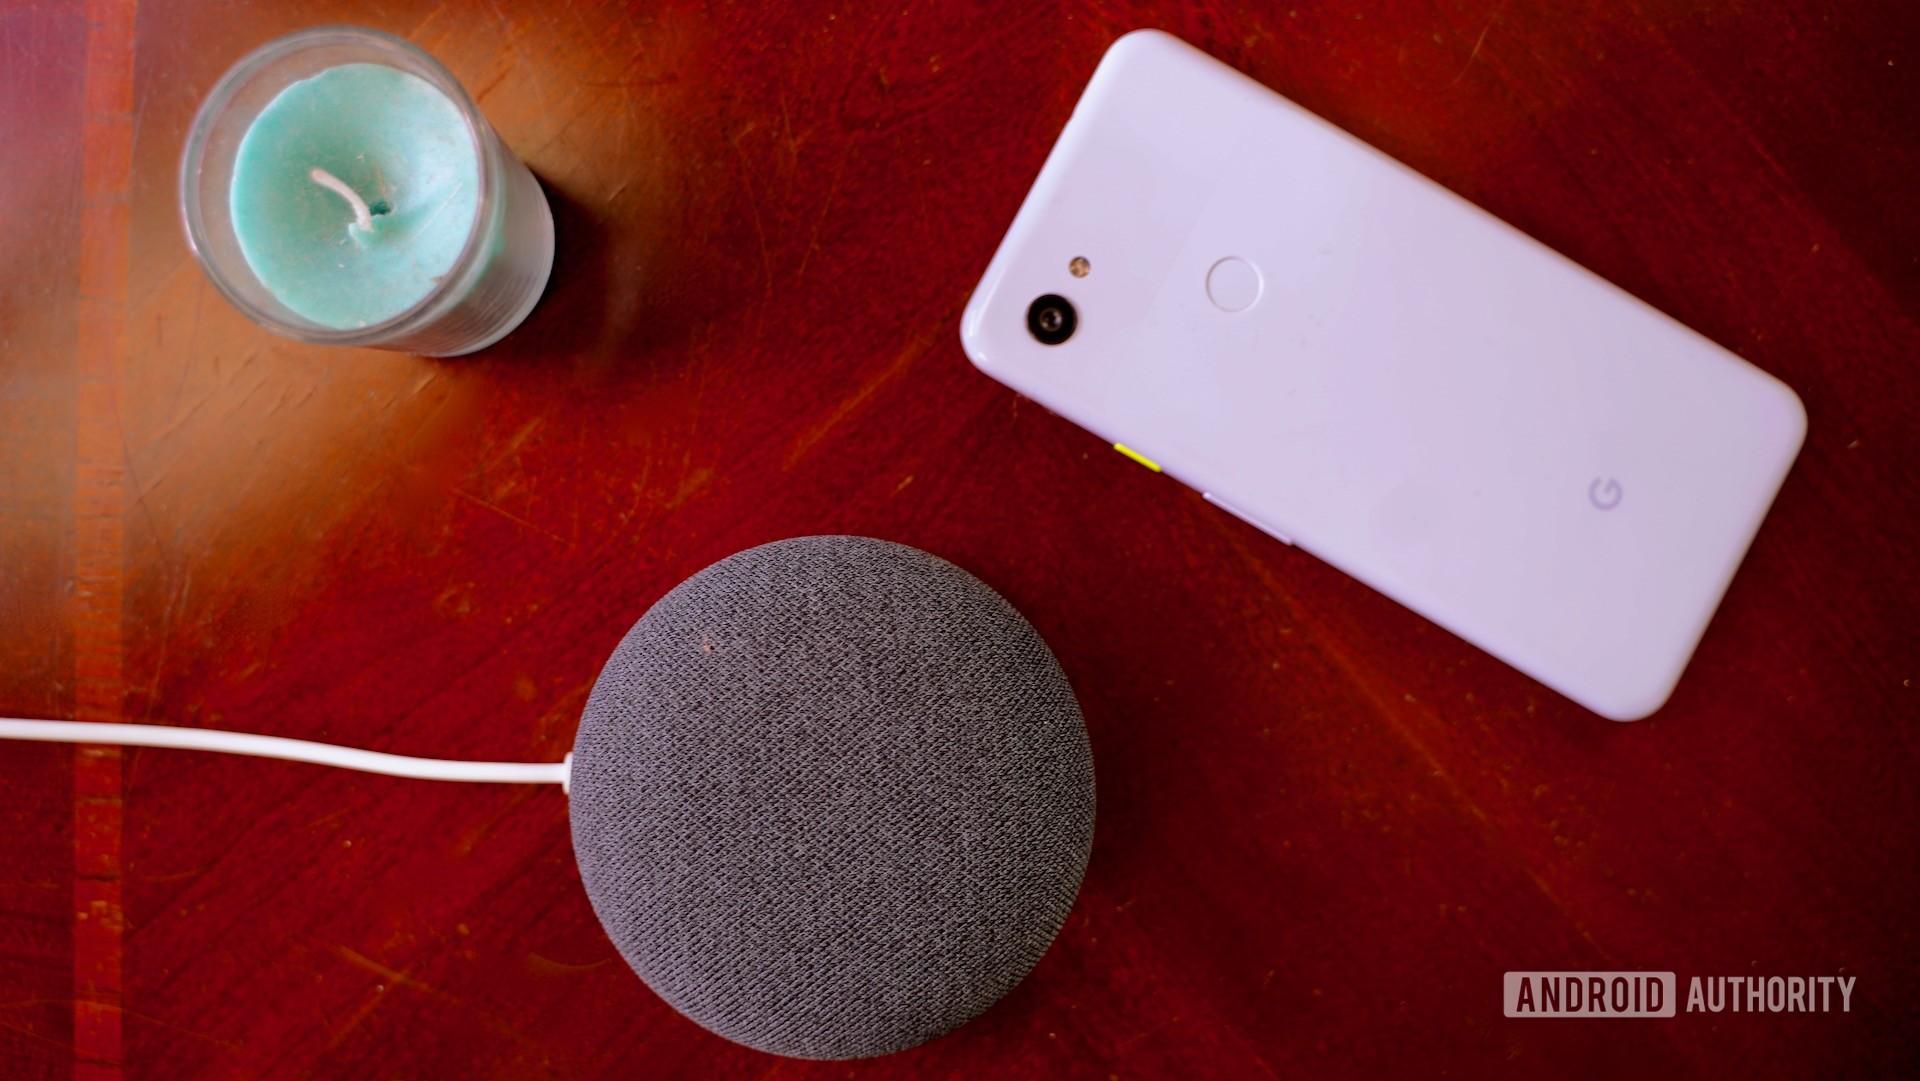 Google Nest Mini on end table